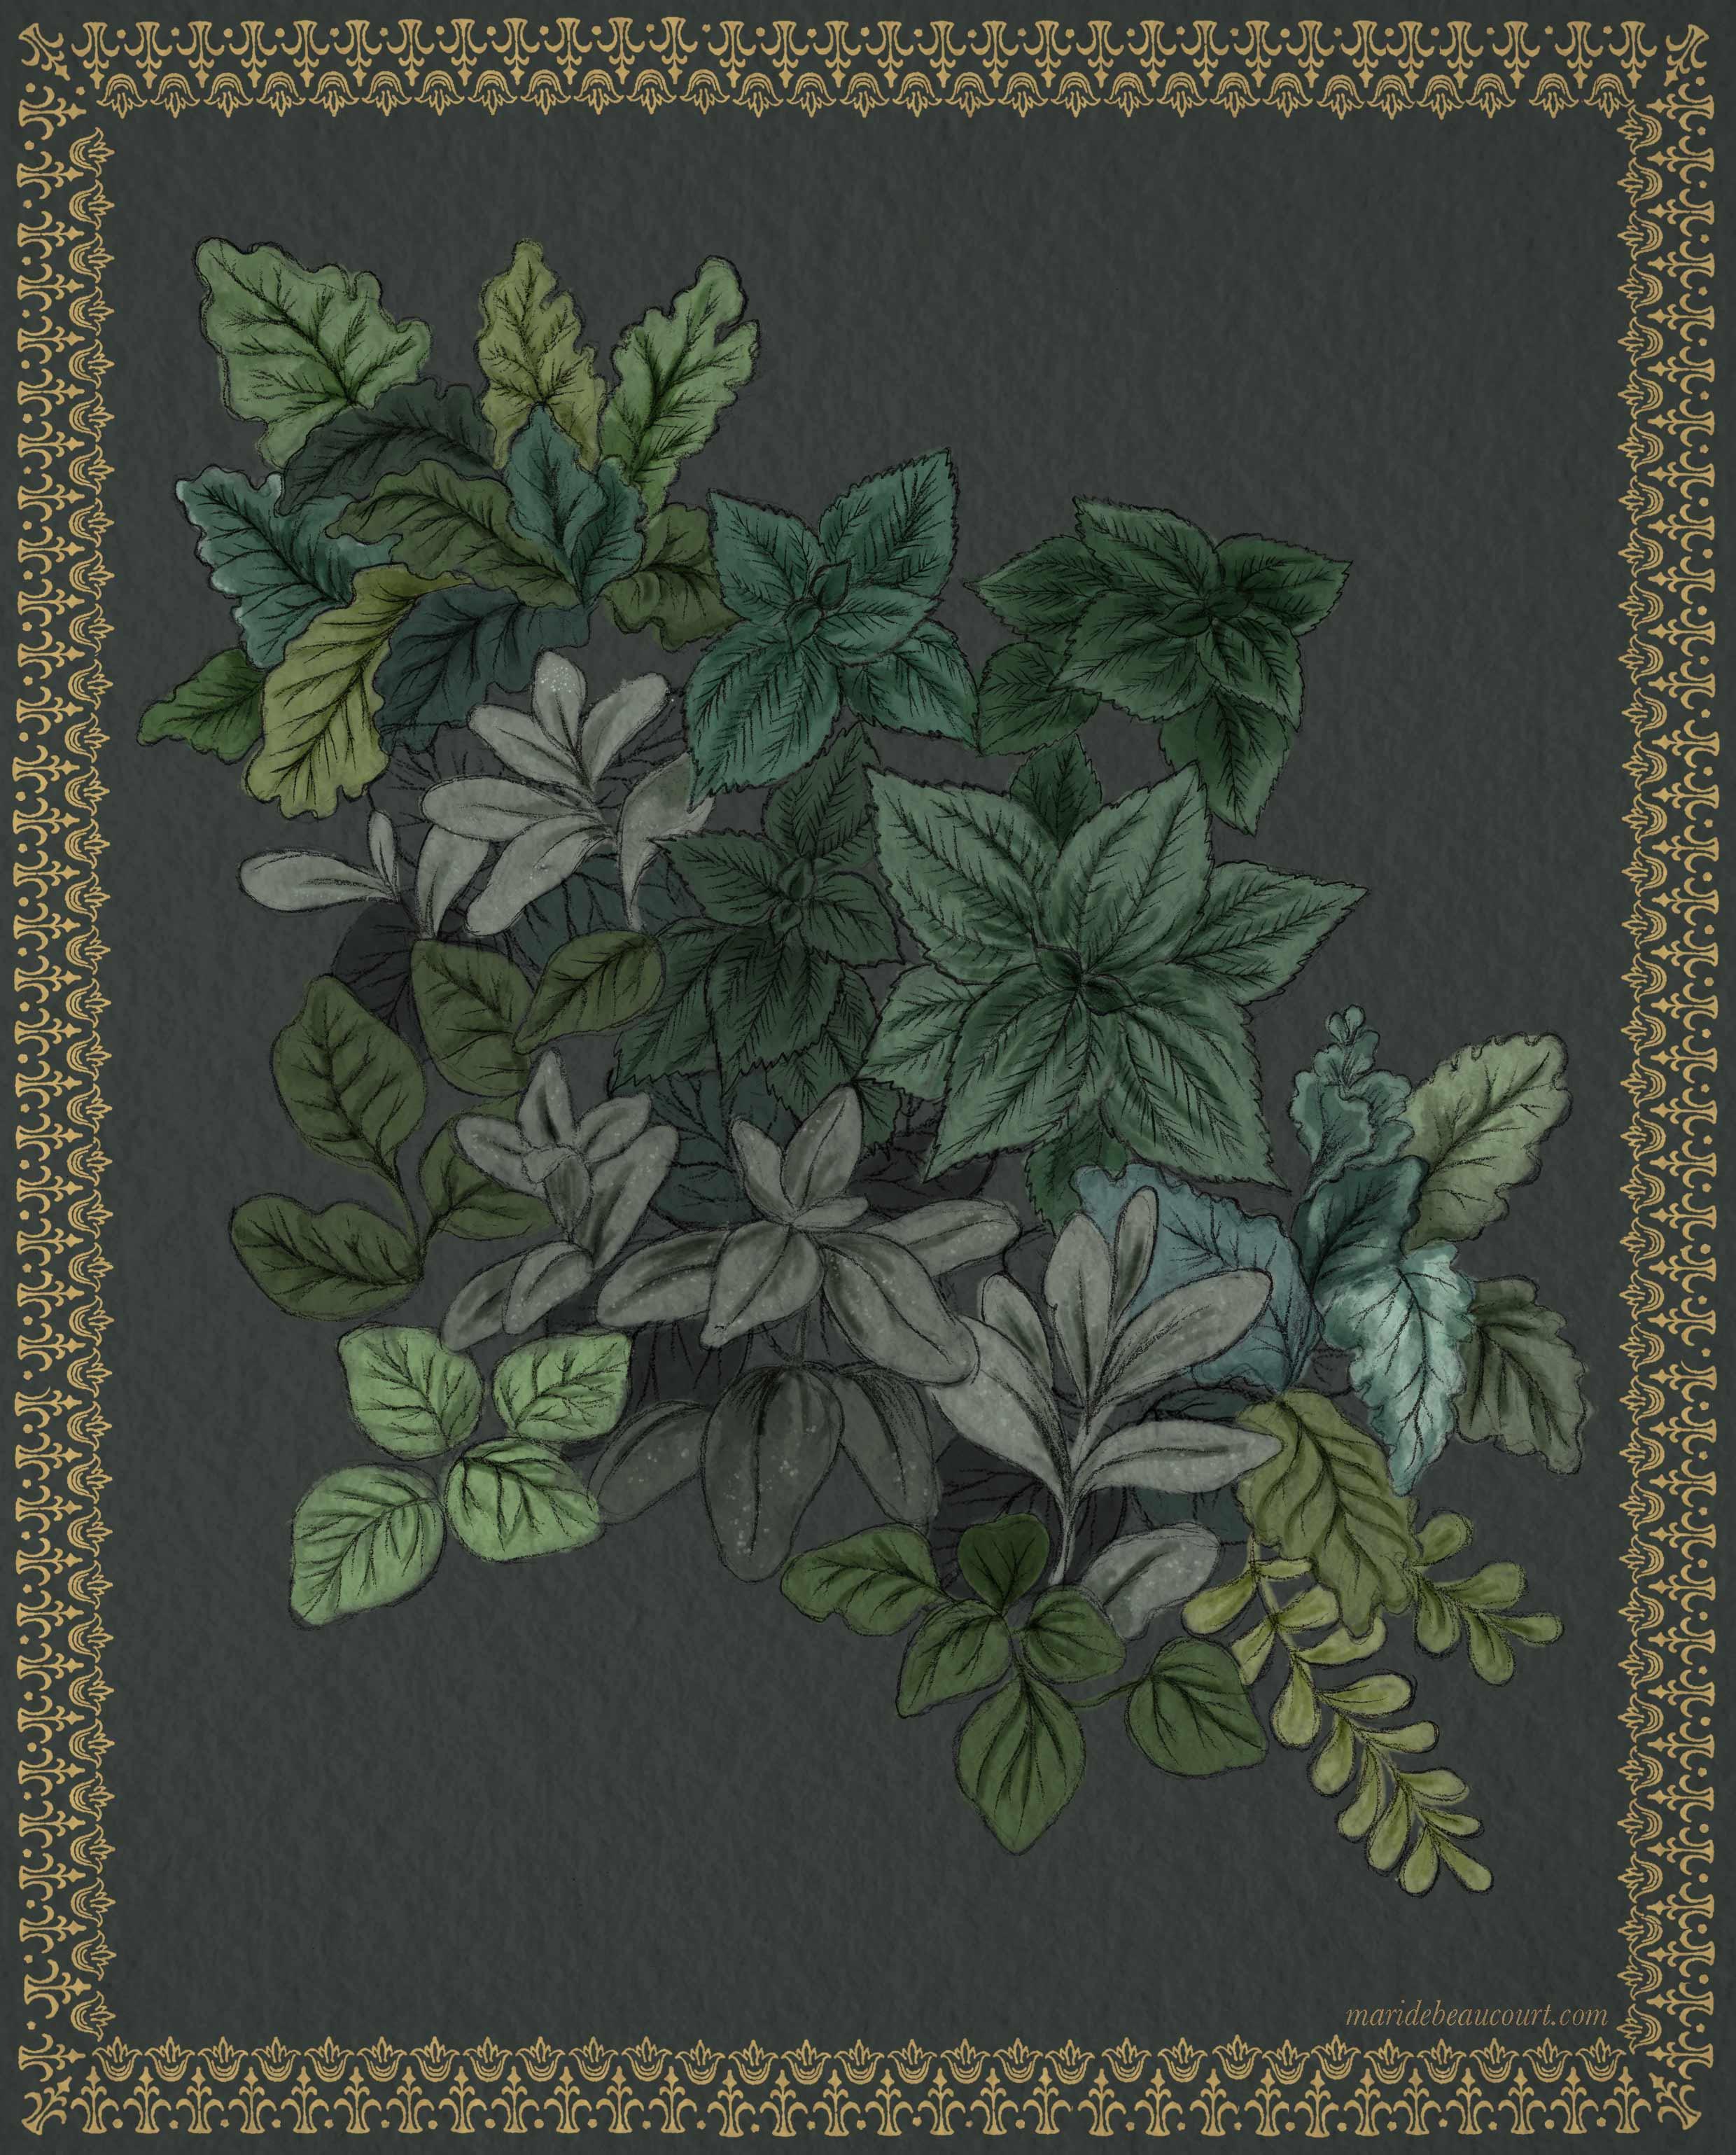 Marie-de-beaucourt-2018-Botanic-illustration-Feuillages-WEB.jpg